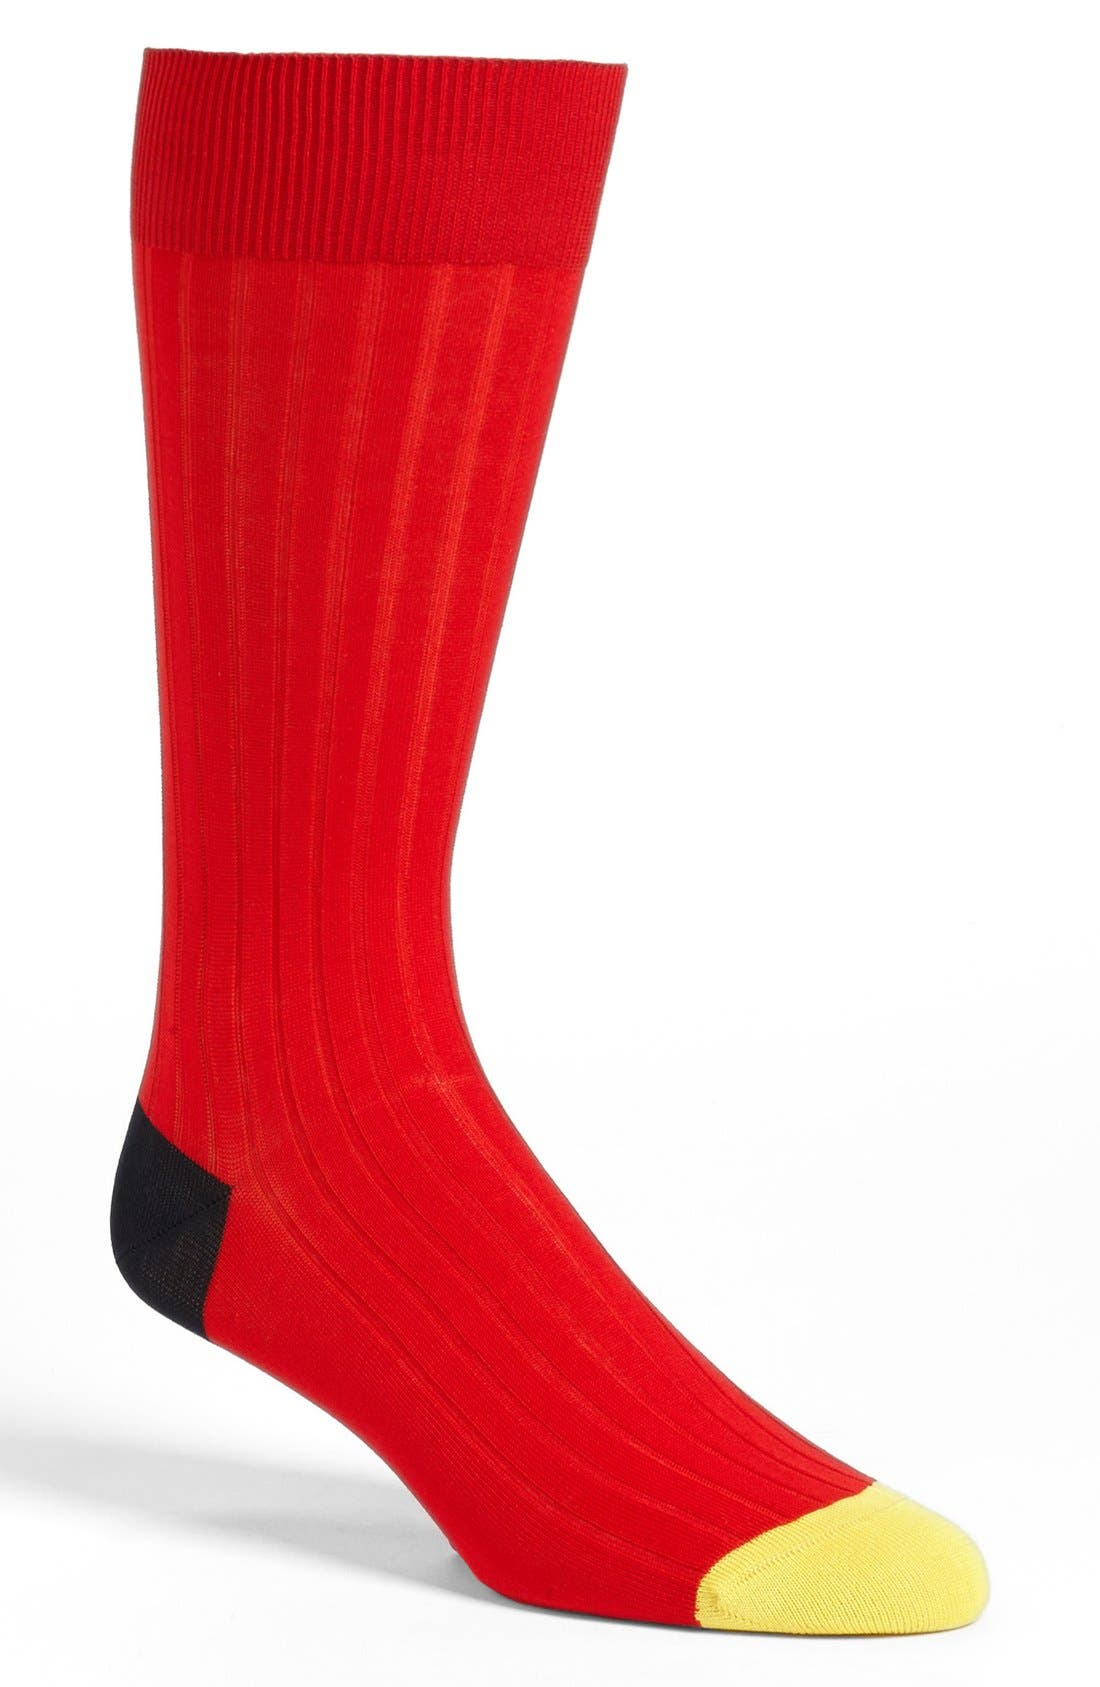 Alternate Image 1 Selected - Pantherella 'Portobello' Socks